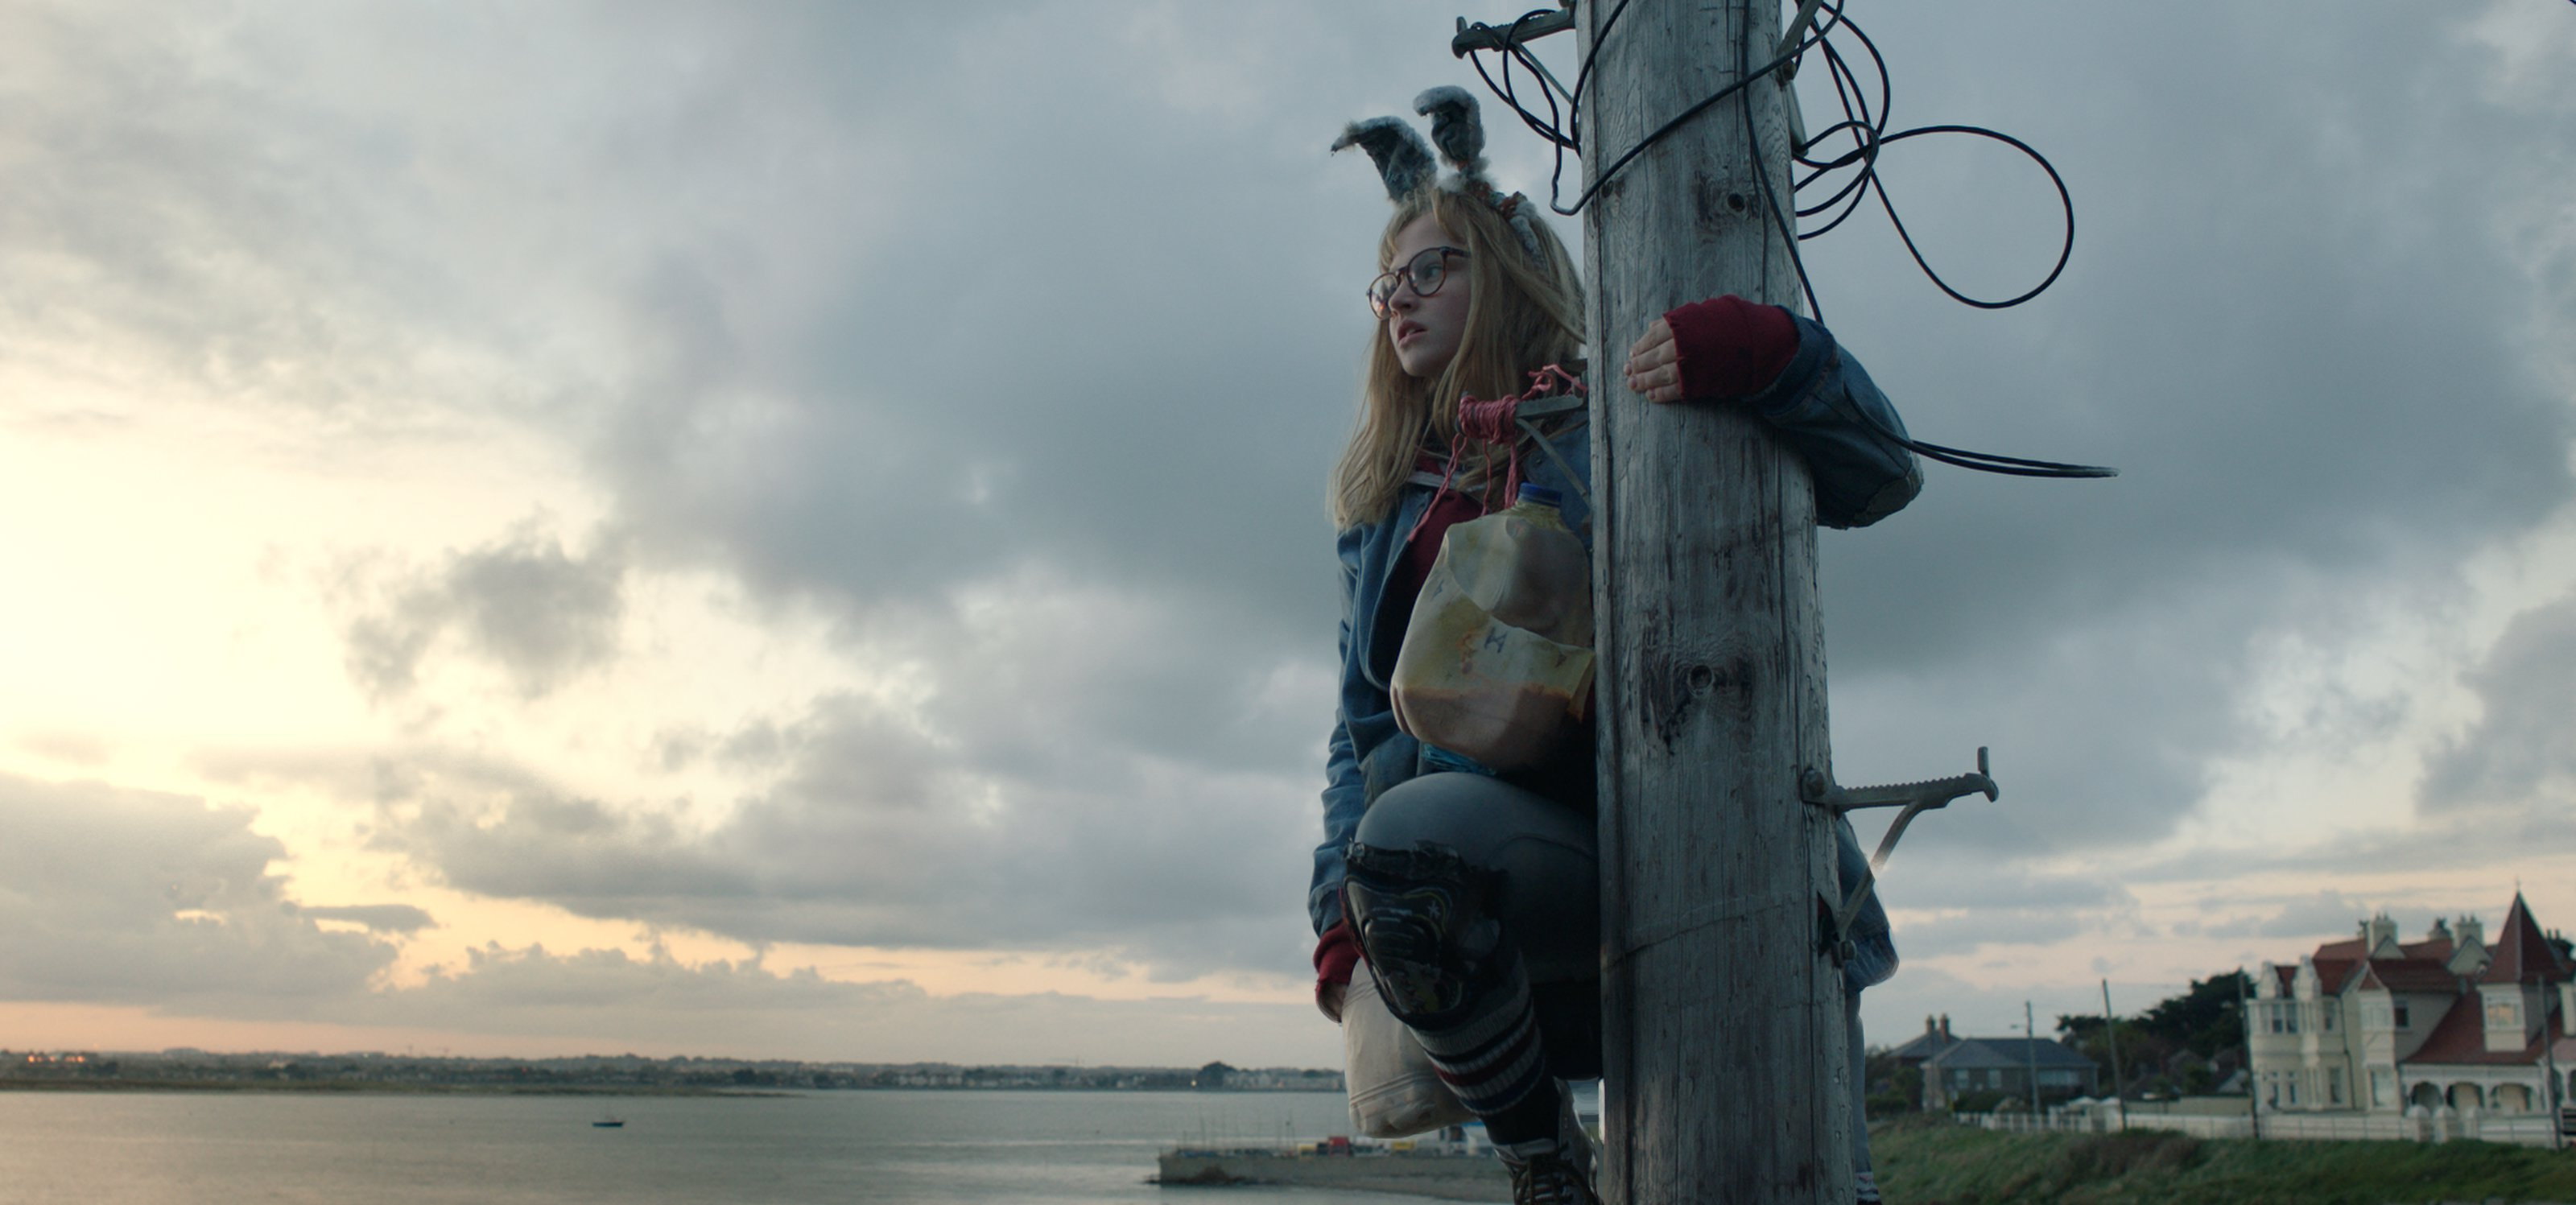 madison-wolfe-in-i-kill-giants-courtesy-of-rlje-films